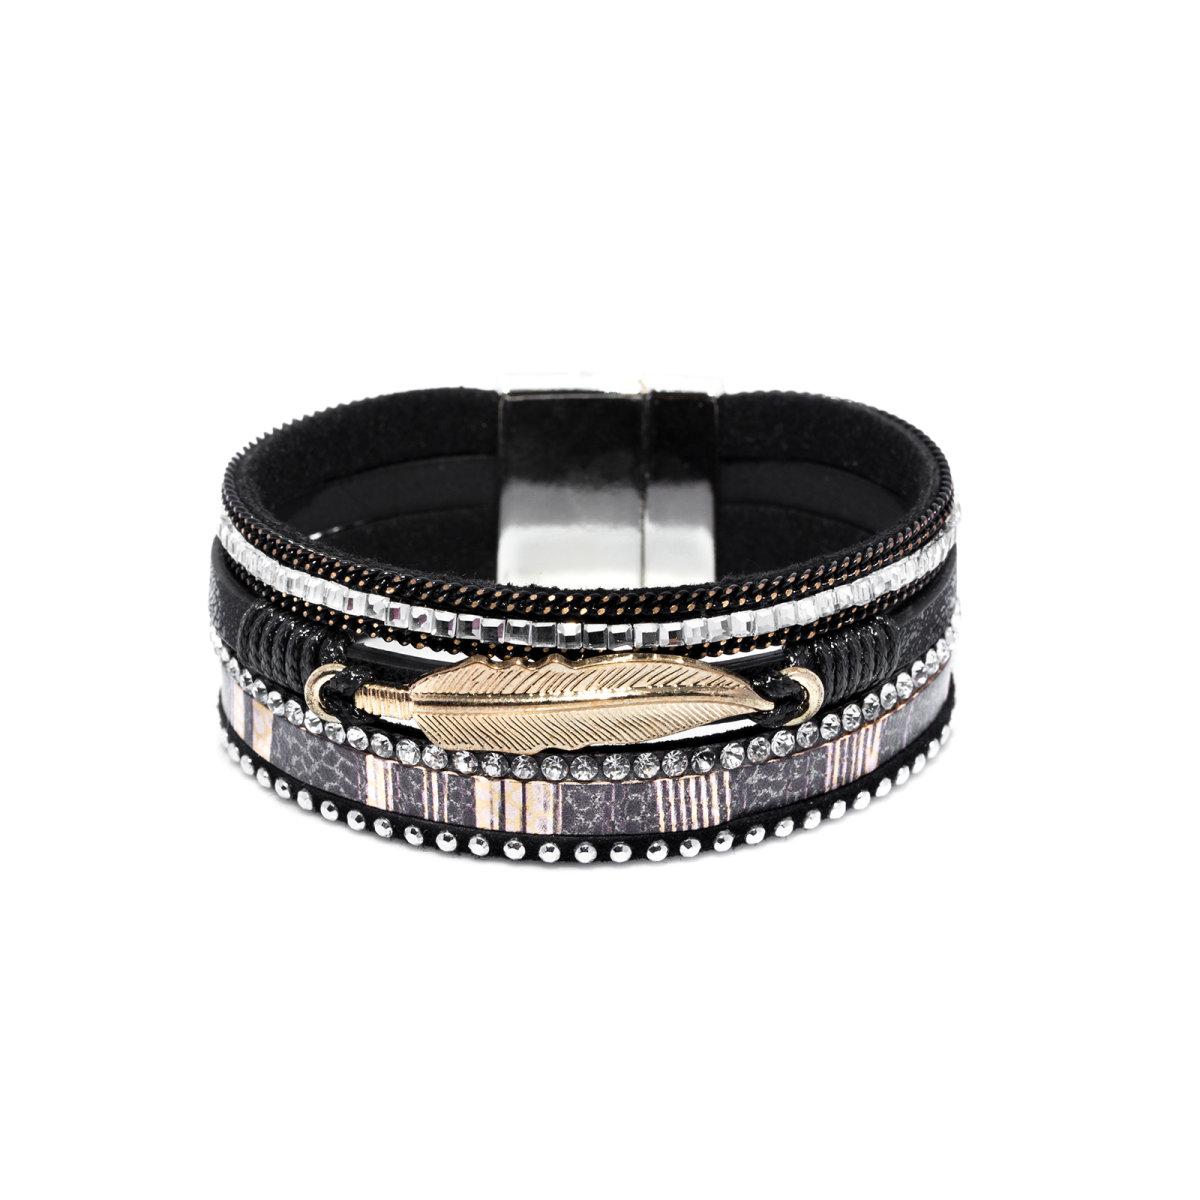 59716d87ef84 Bracelet with metallic feather